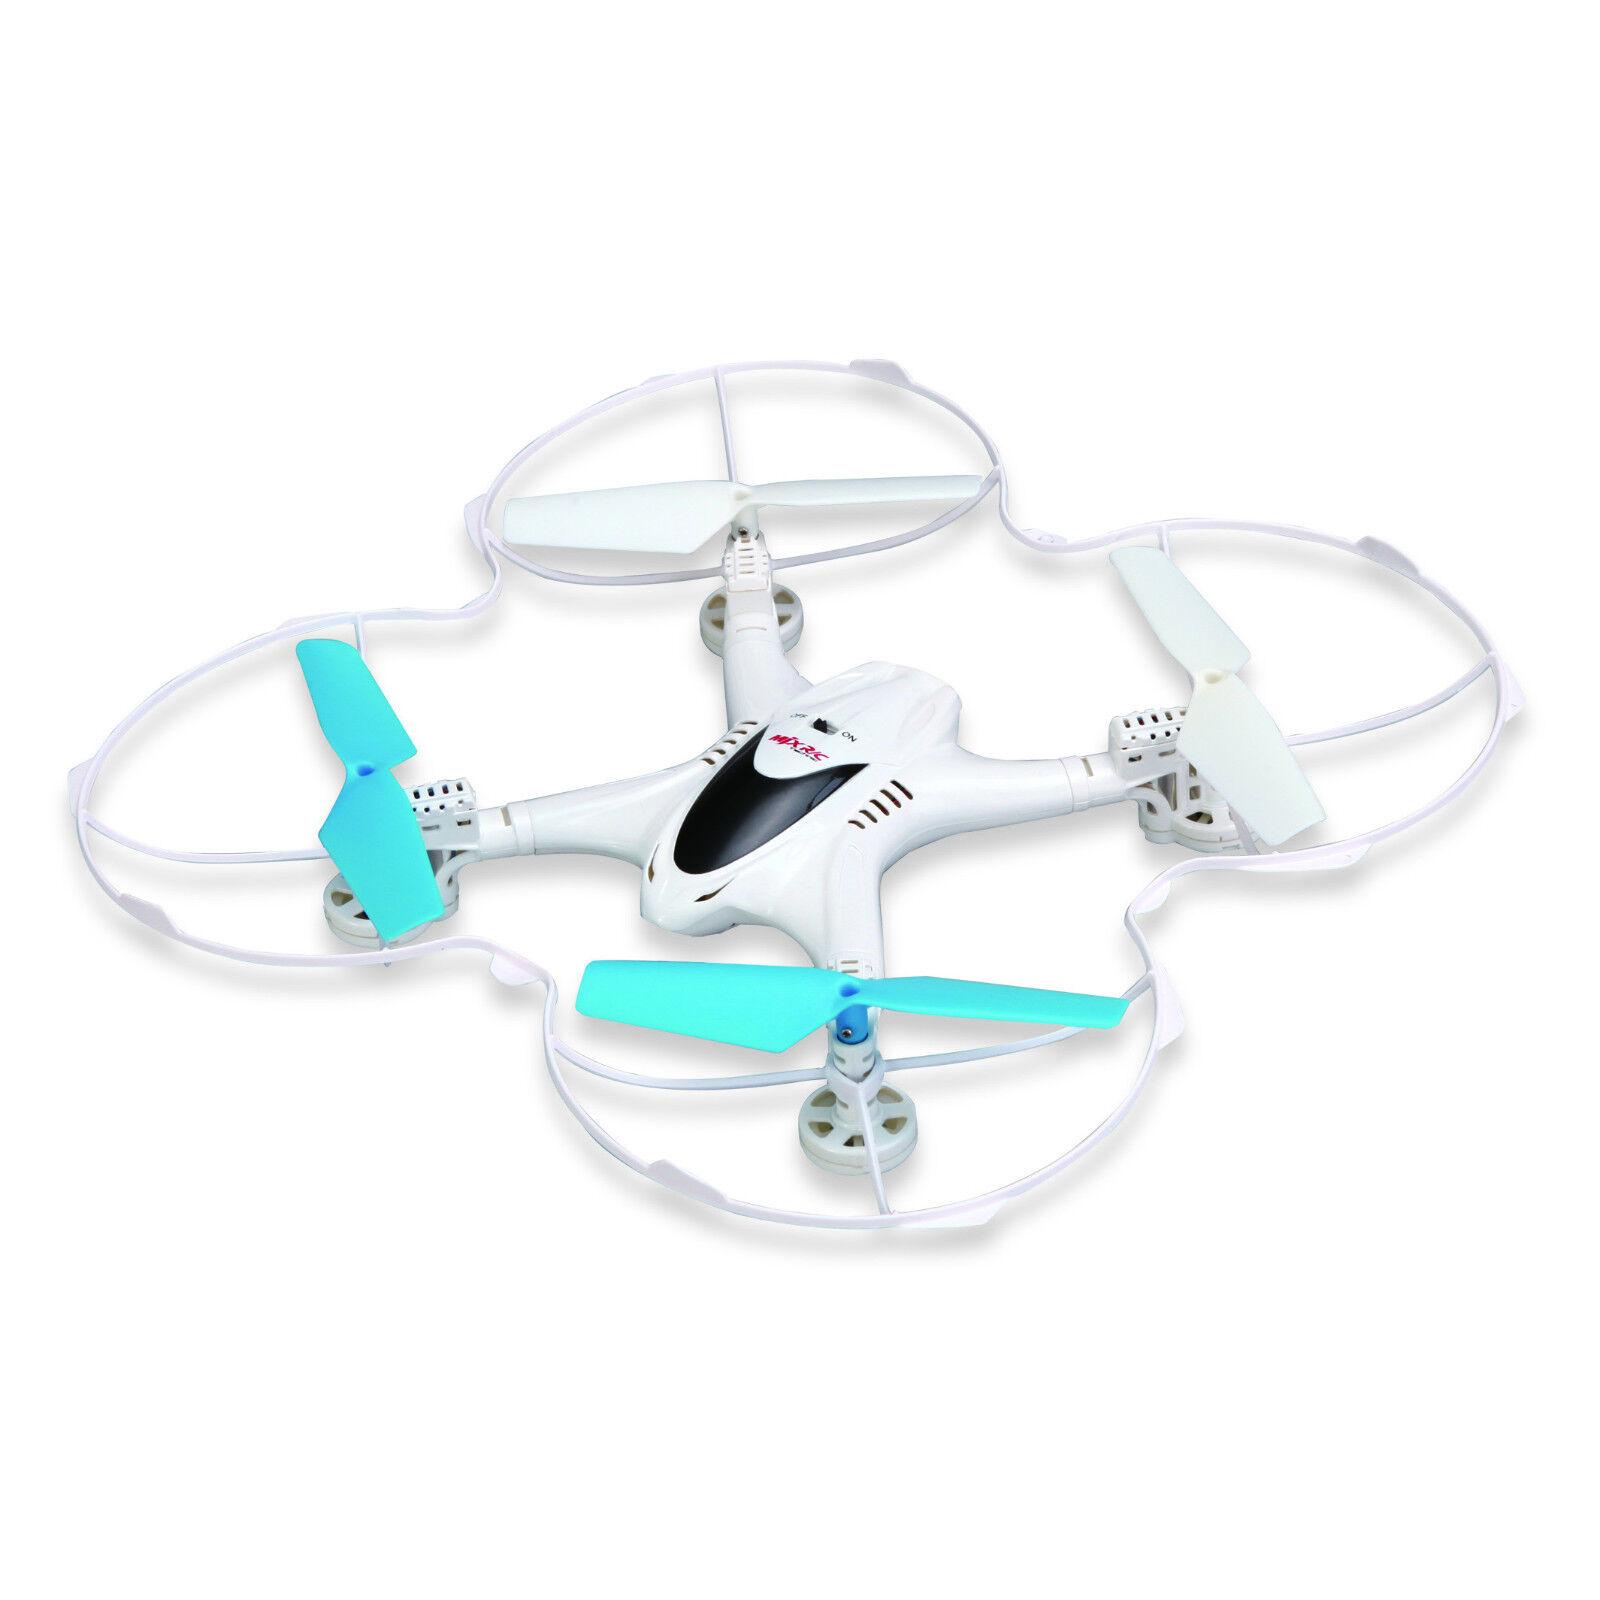 FPV Drone Quadcopter con Live fotocamera MJX x300c BIANCA RC WIFI ANDROID IOS